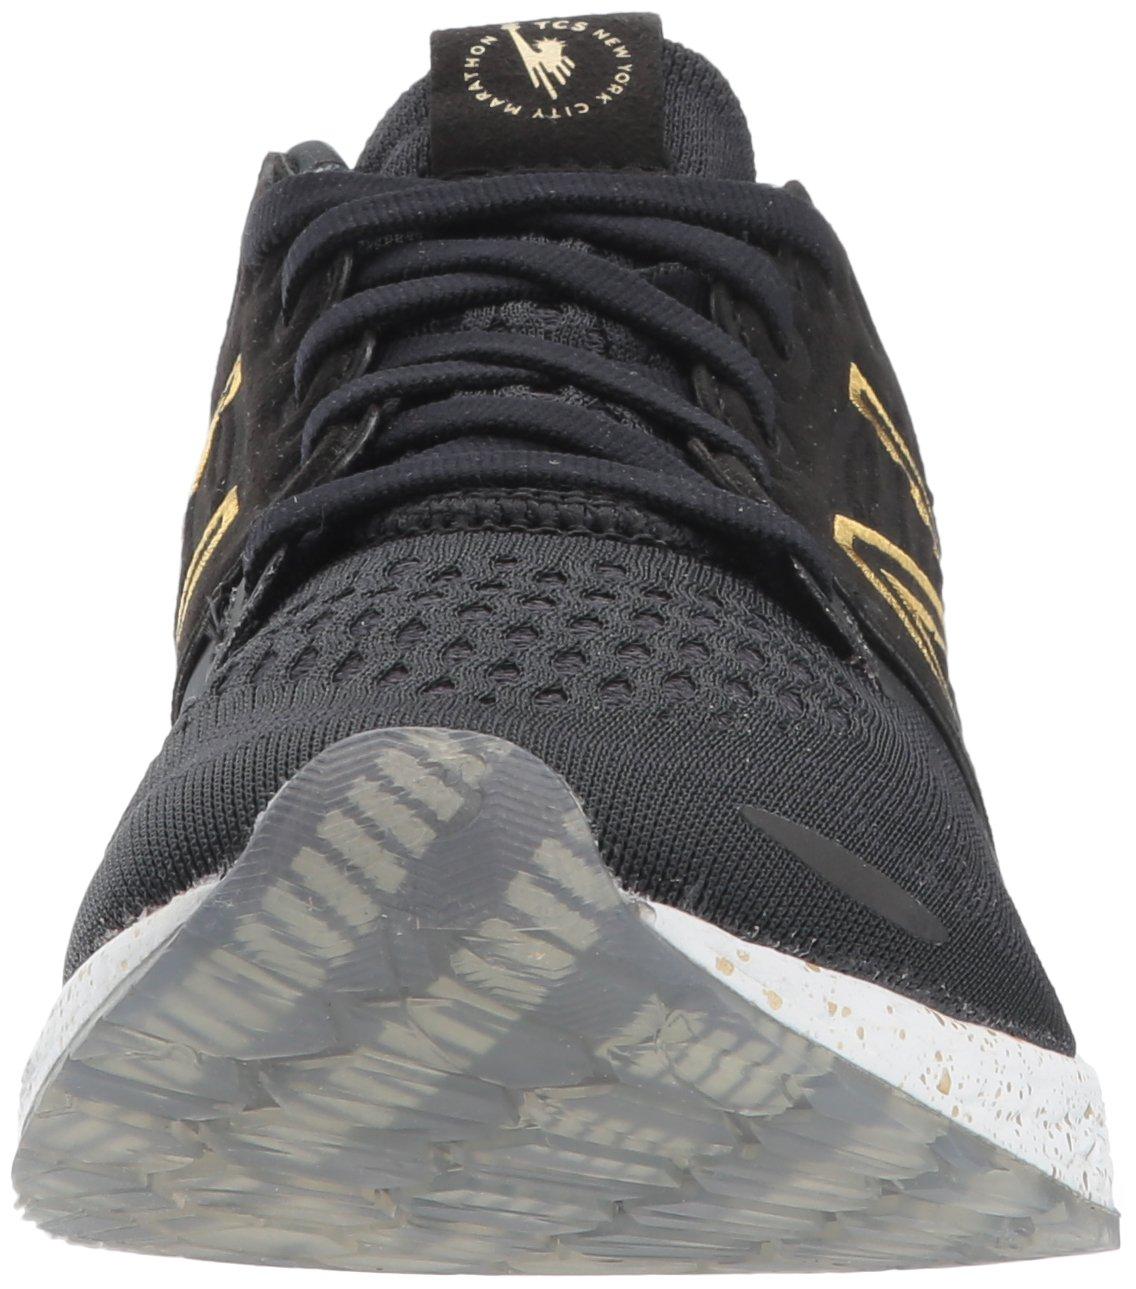 premium selection e85f0 482ca ... Zapatillas de running New Balance NYC Fresh Negro Foam Foam Zante  Balance V3 para mujer Negro ...